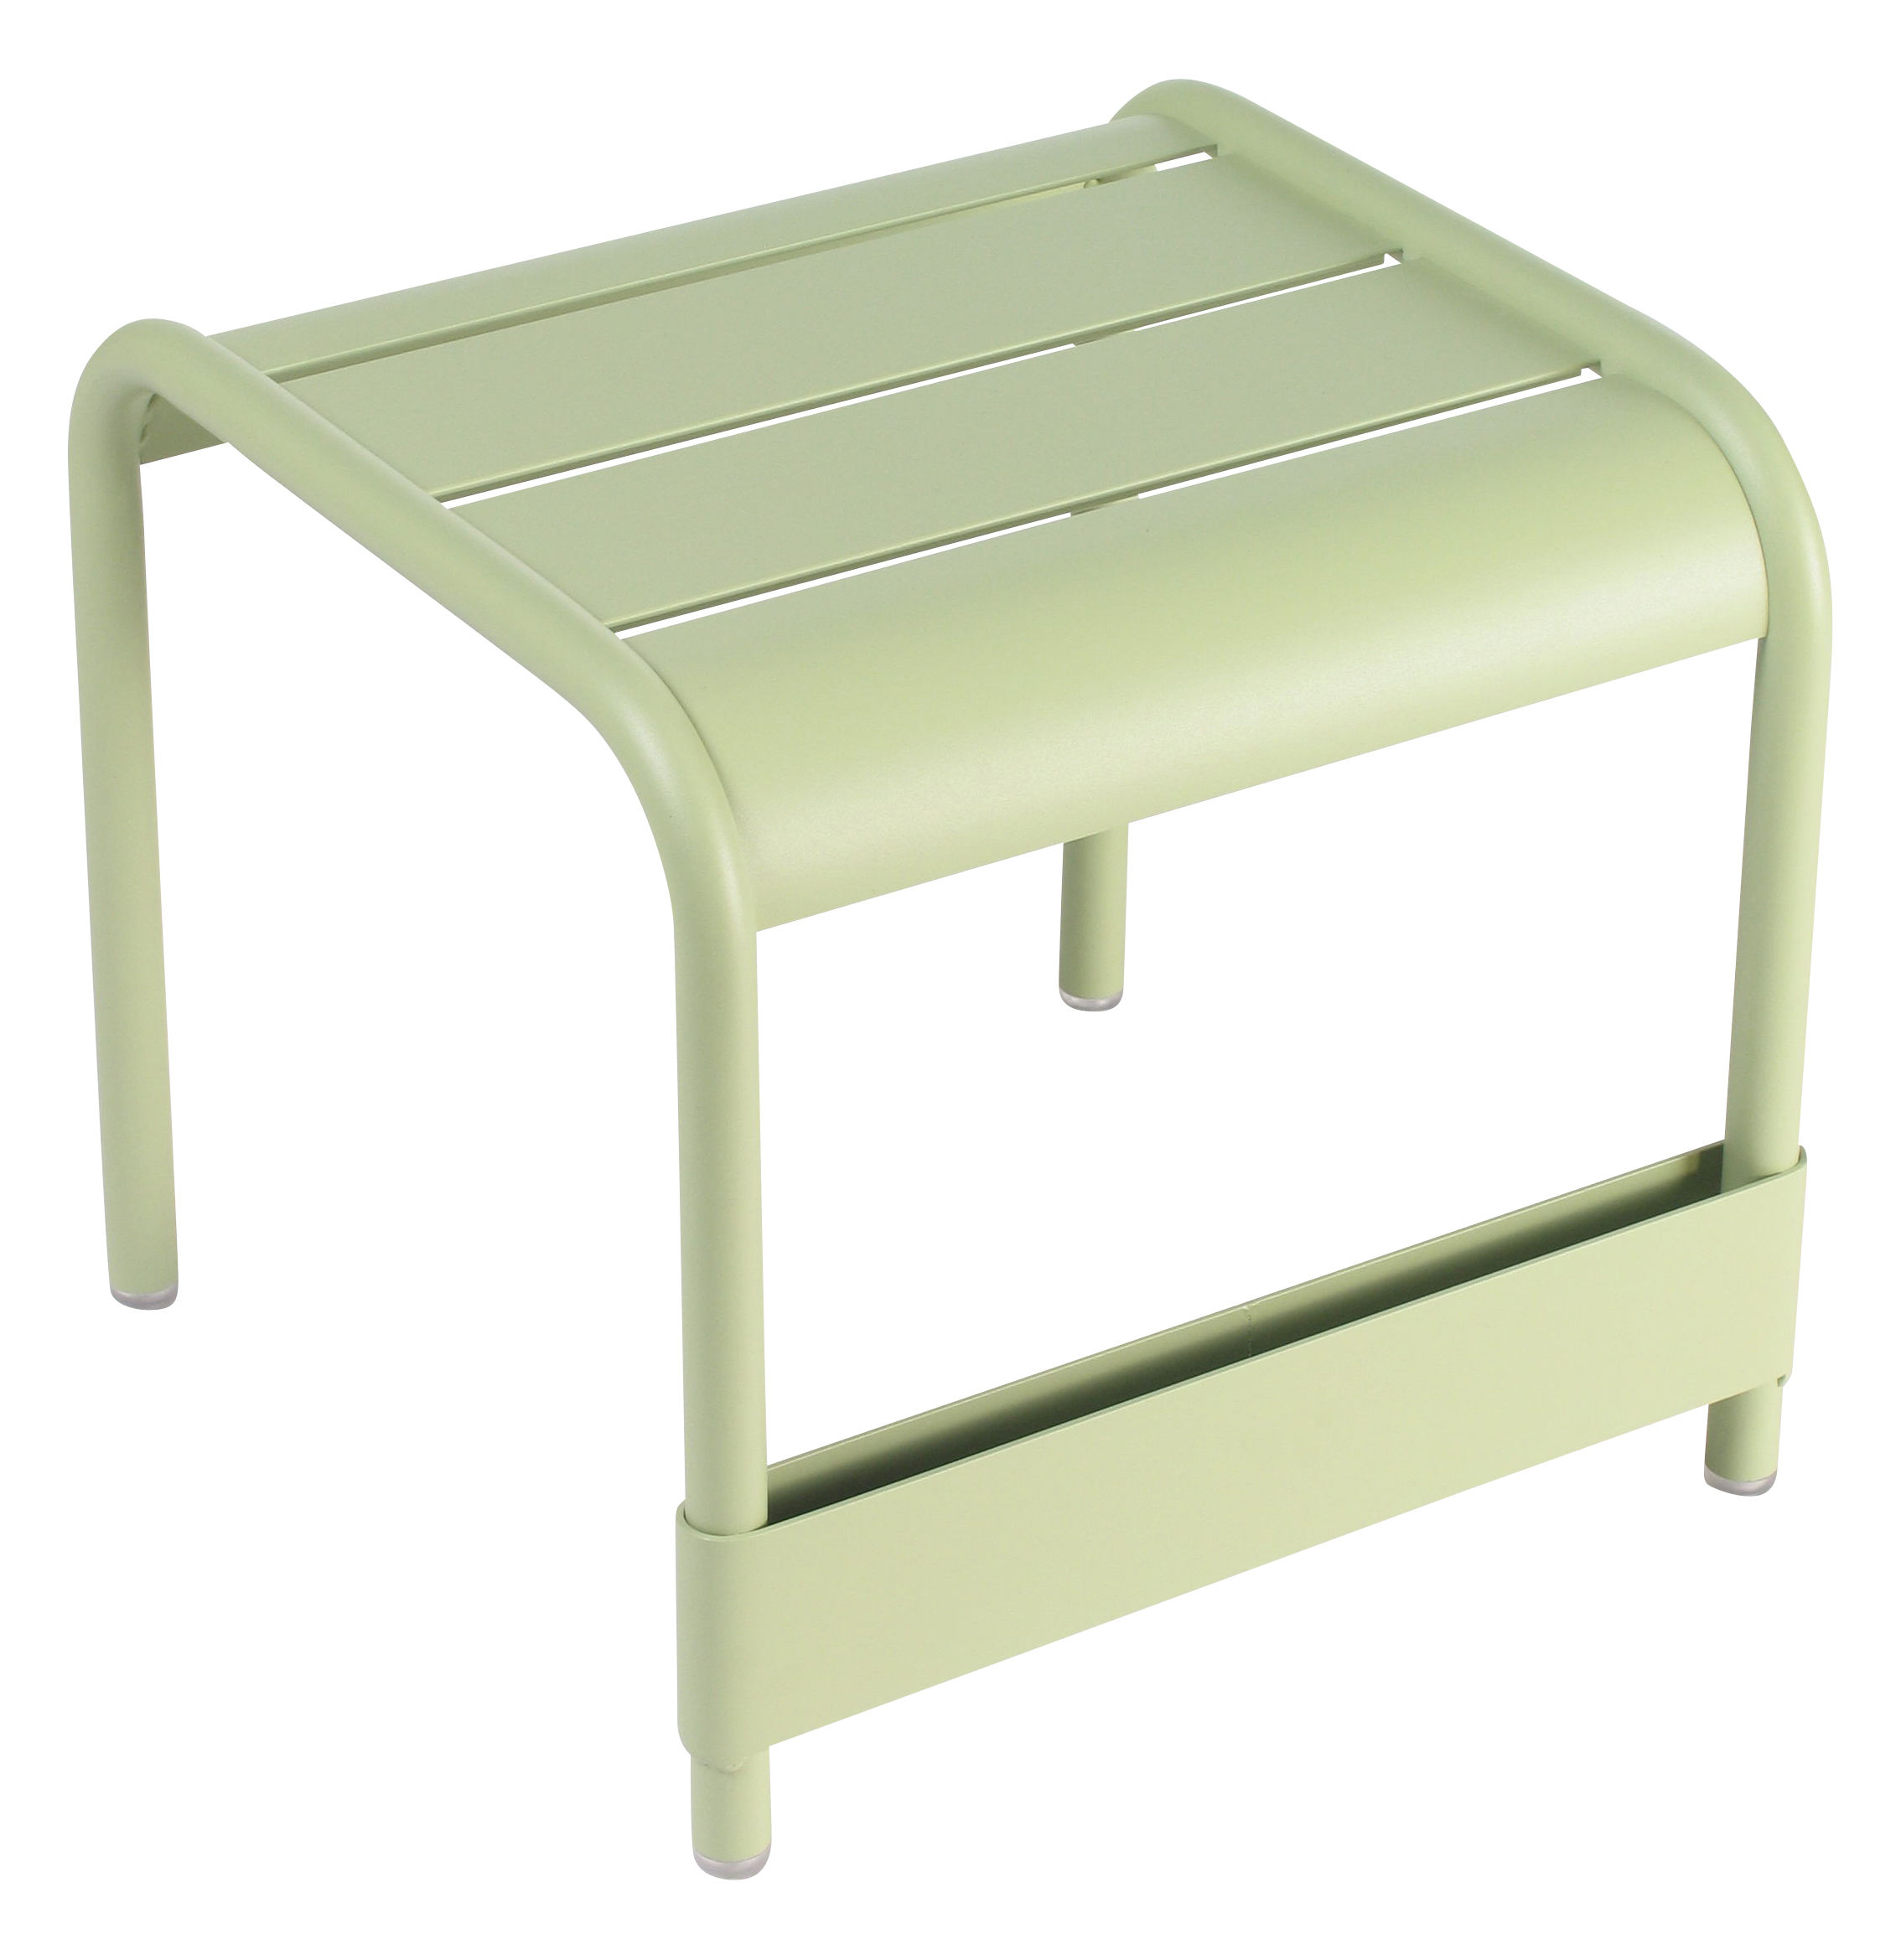 table d 39 appoint luxembourg pouf l 42 cm tilleul fermob. Black Bedroom Furniture Sets. Home Design Ideas